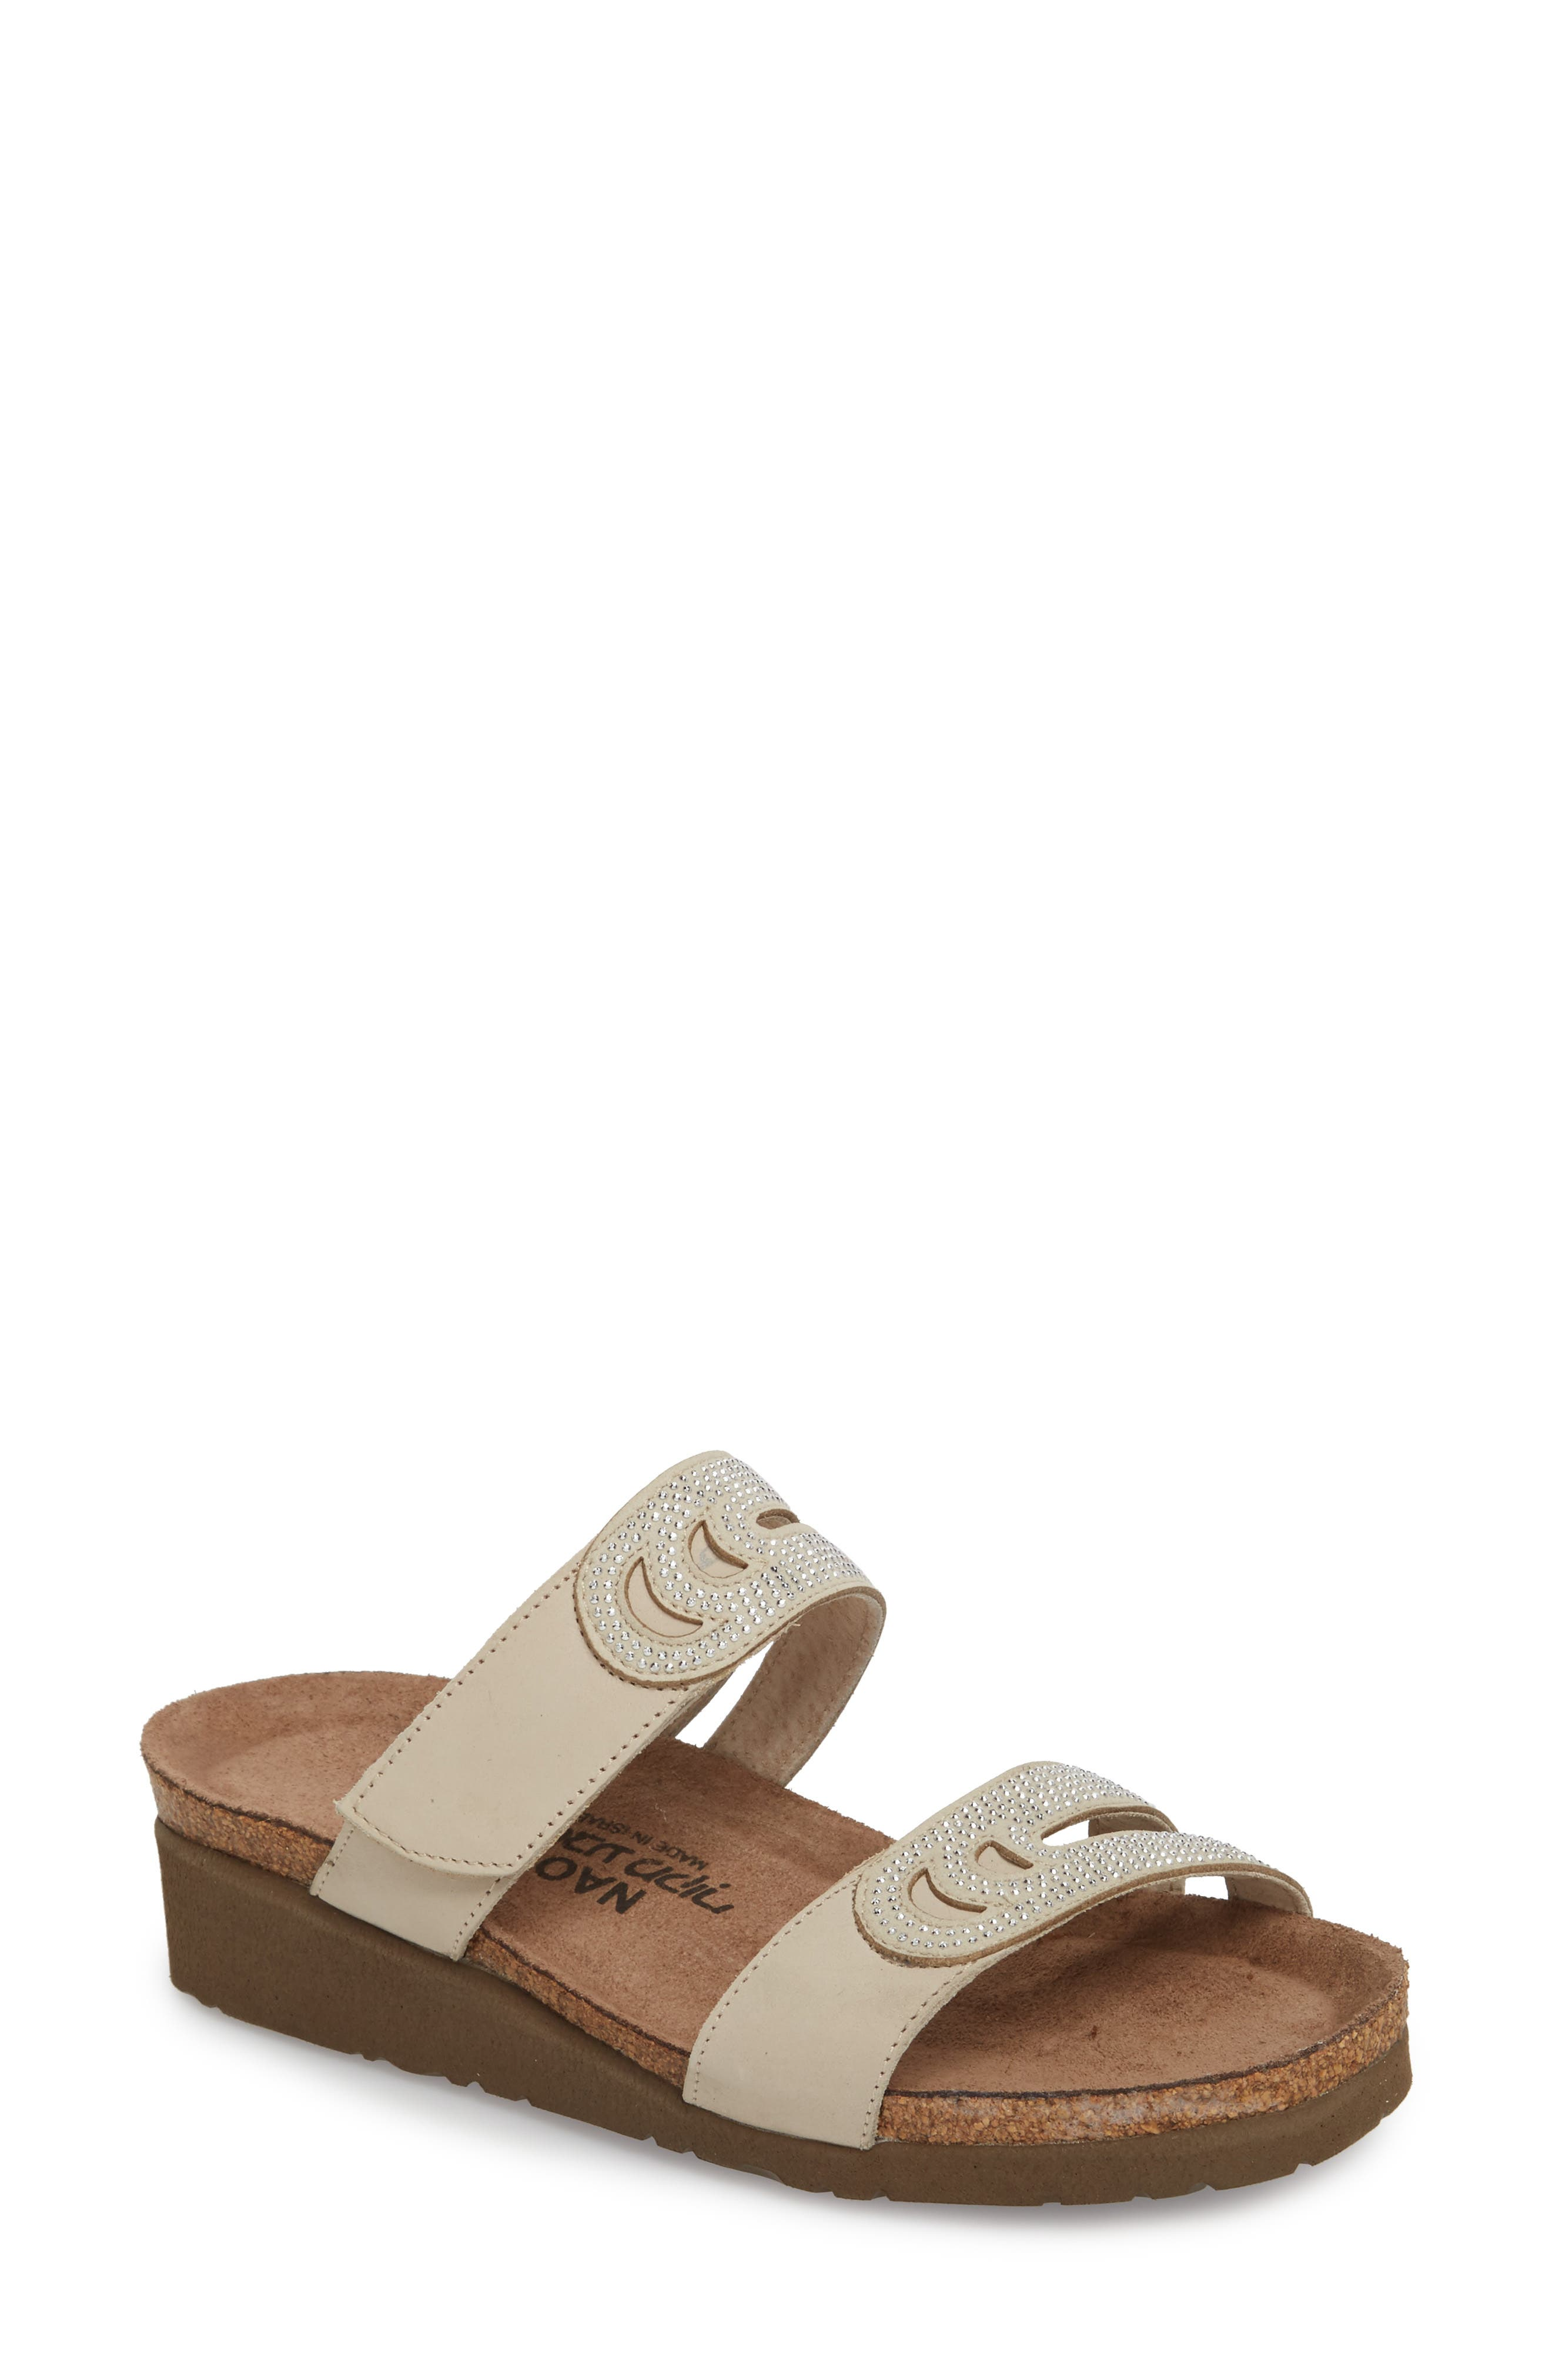 Main Image - Naot Ainsley Studded Slide Sandal (Women)